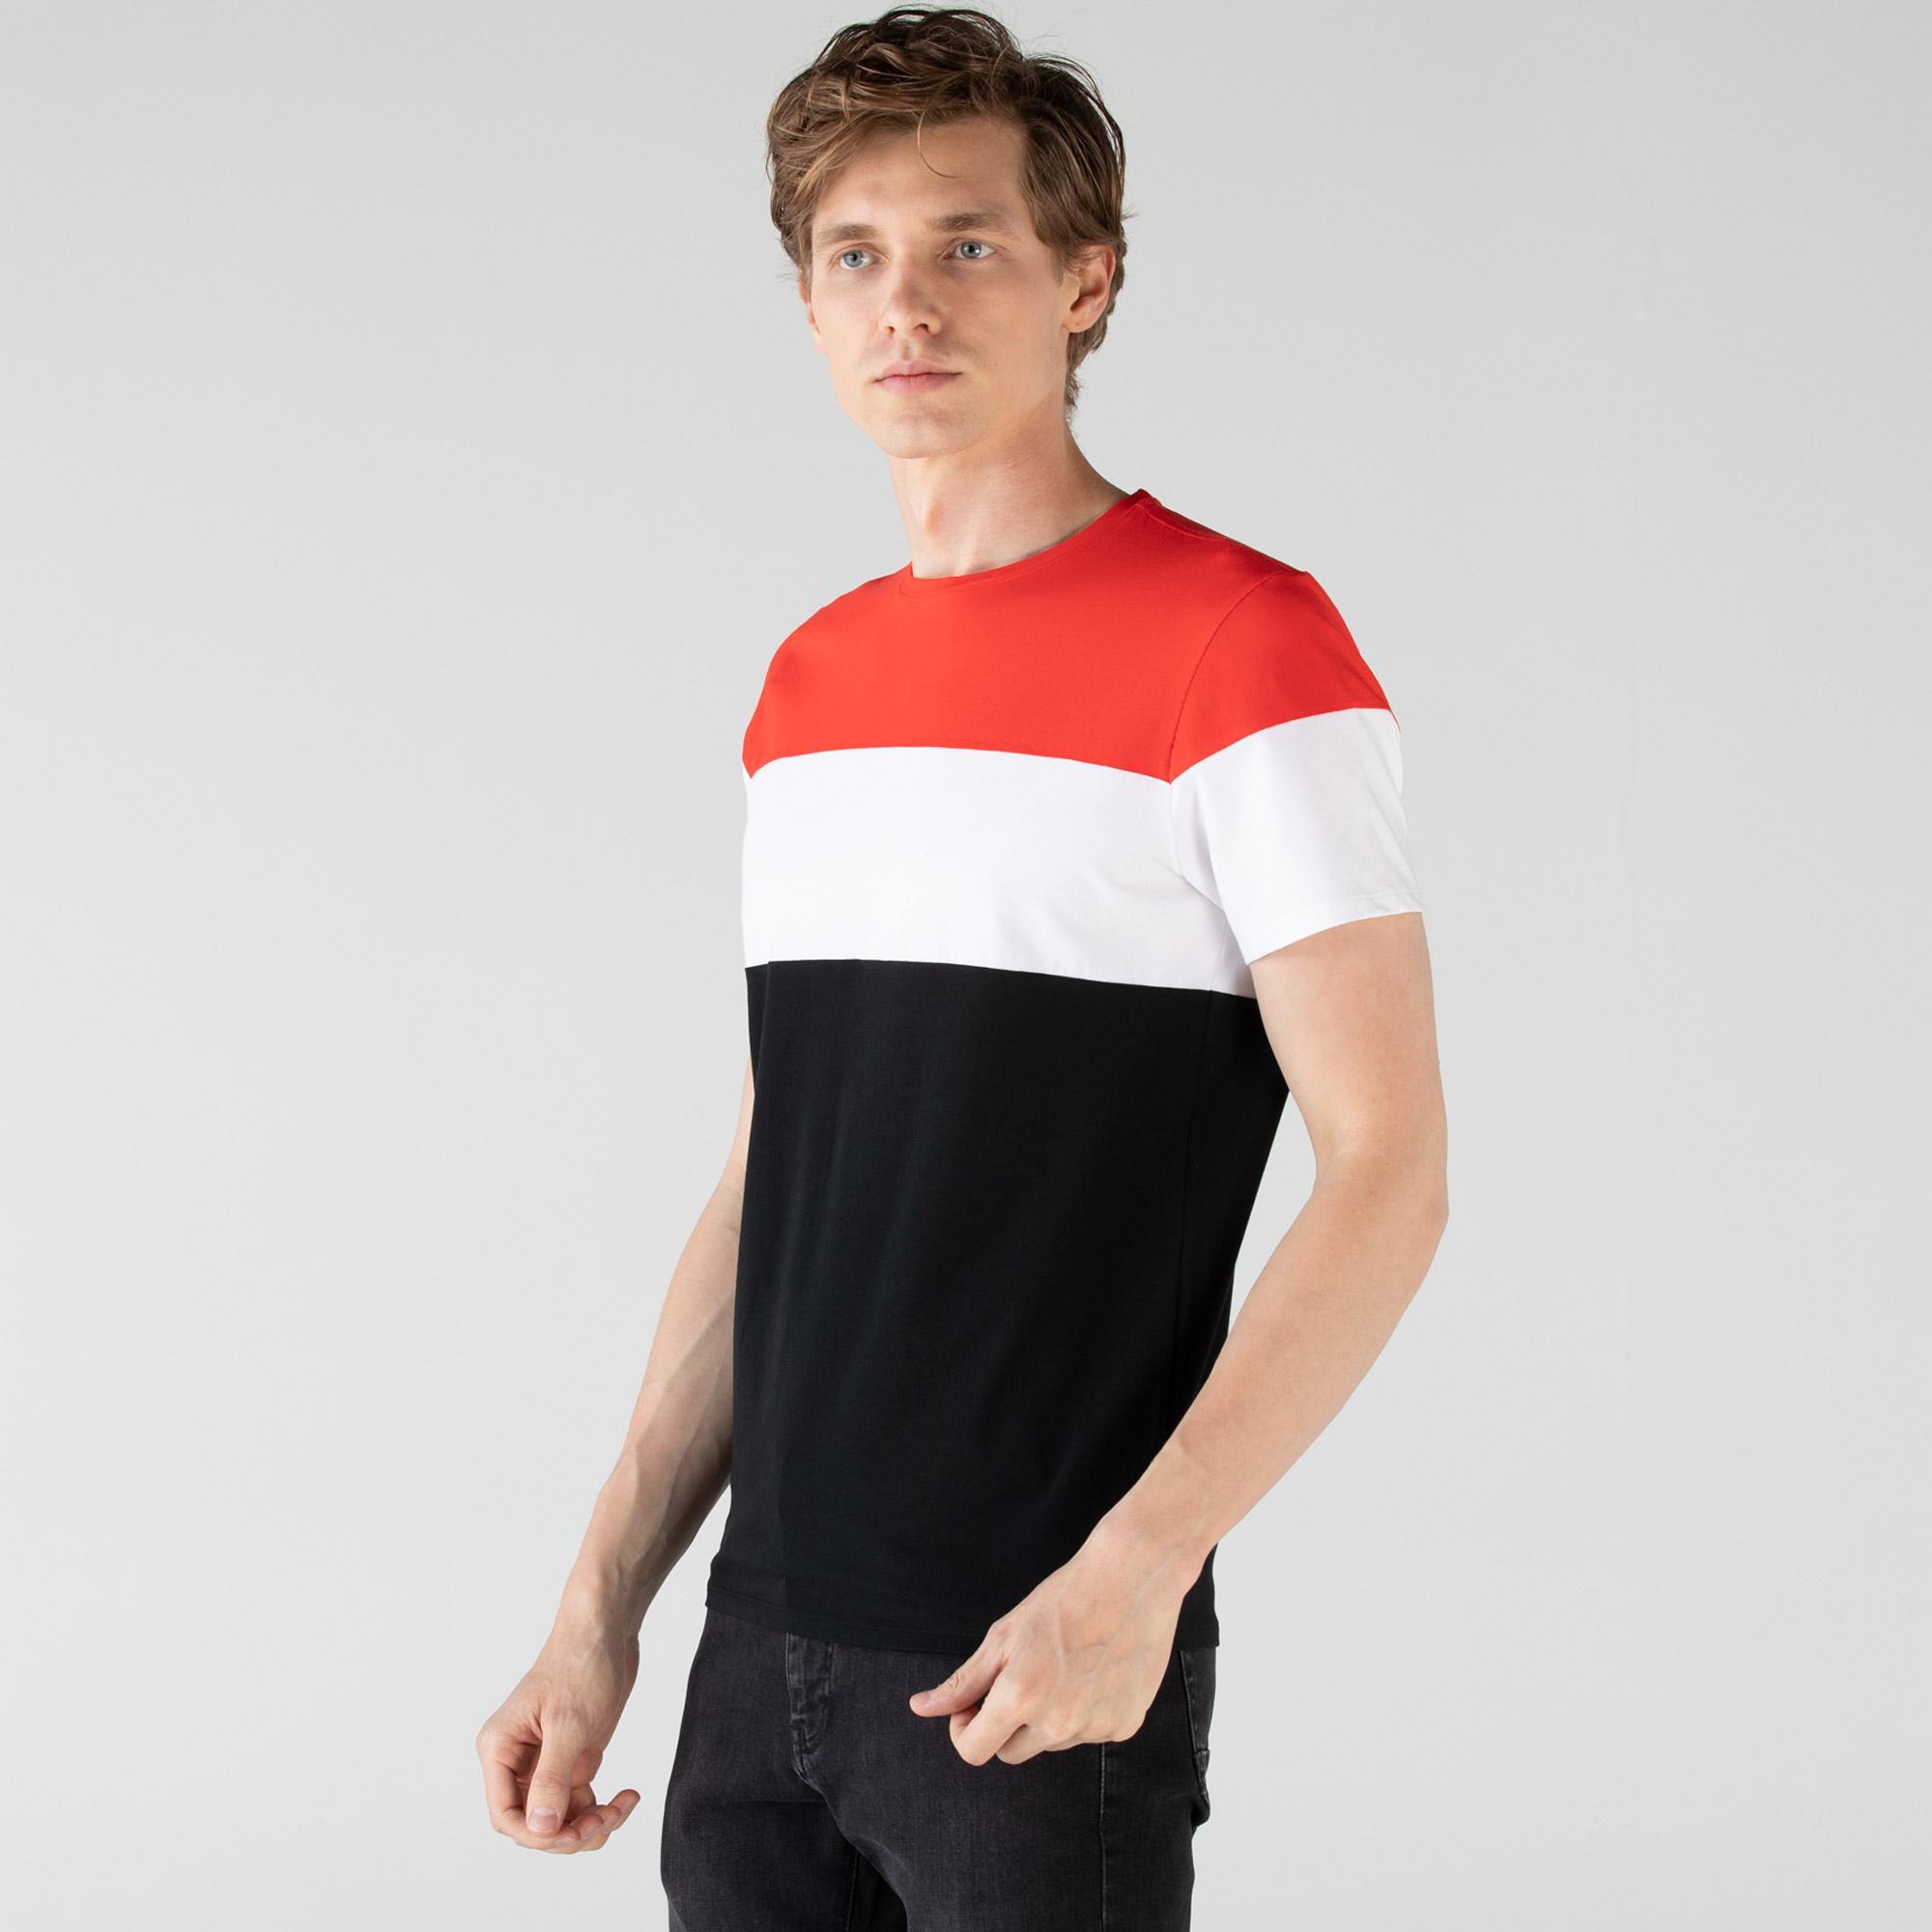 Lacoste Erkek Renk Bloklu Renkli T-Shirt